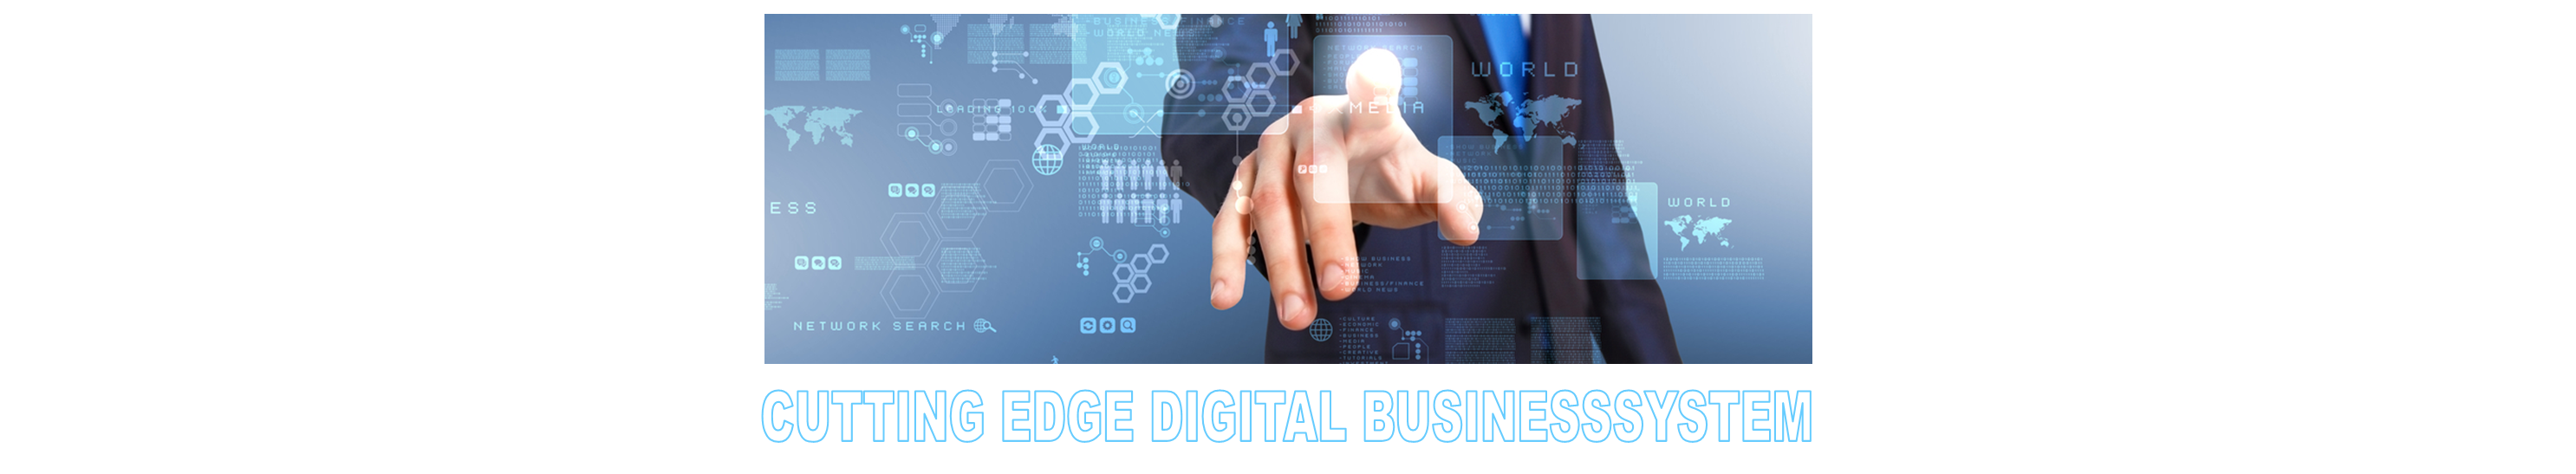 CUTTING-EDGE-DIGITAL-BUSINESSSYSTEM